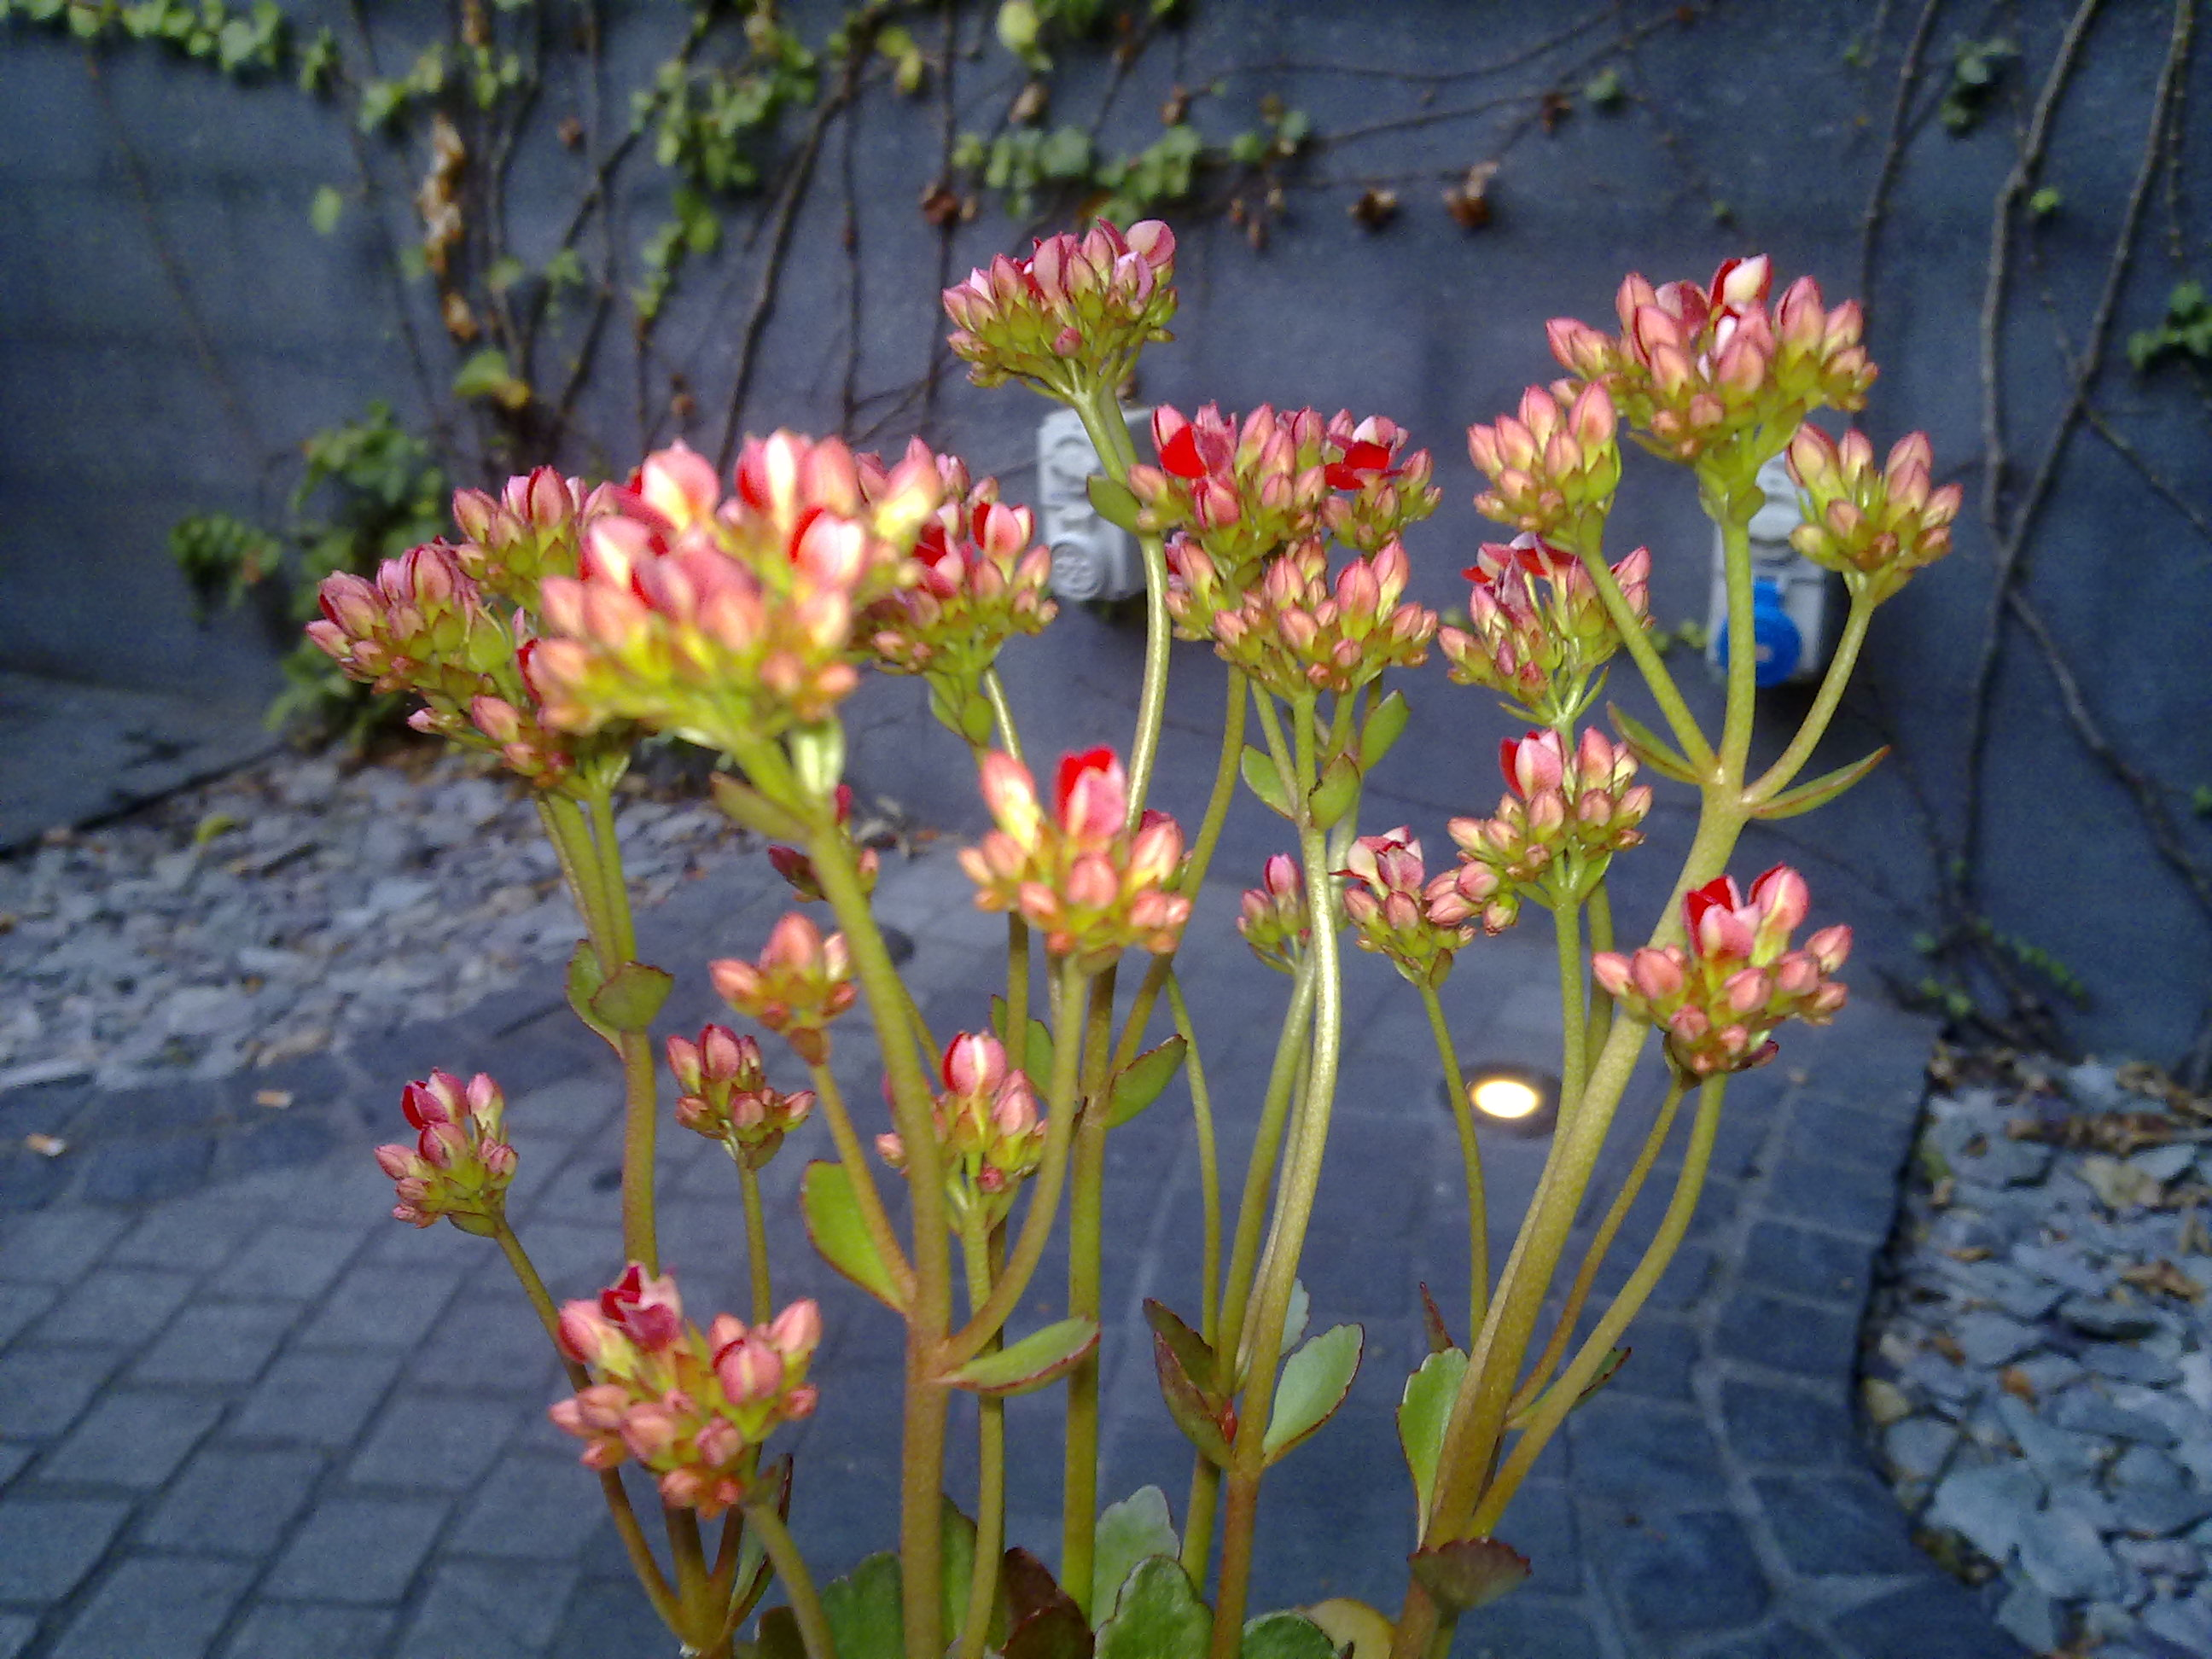 Pot plant at the Beresford Hotel